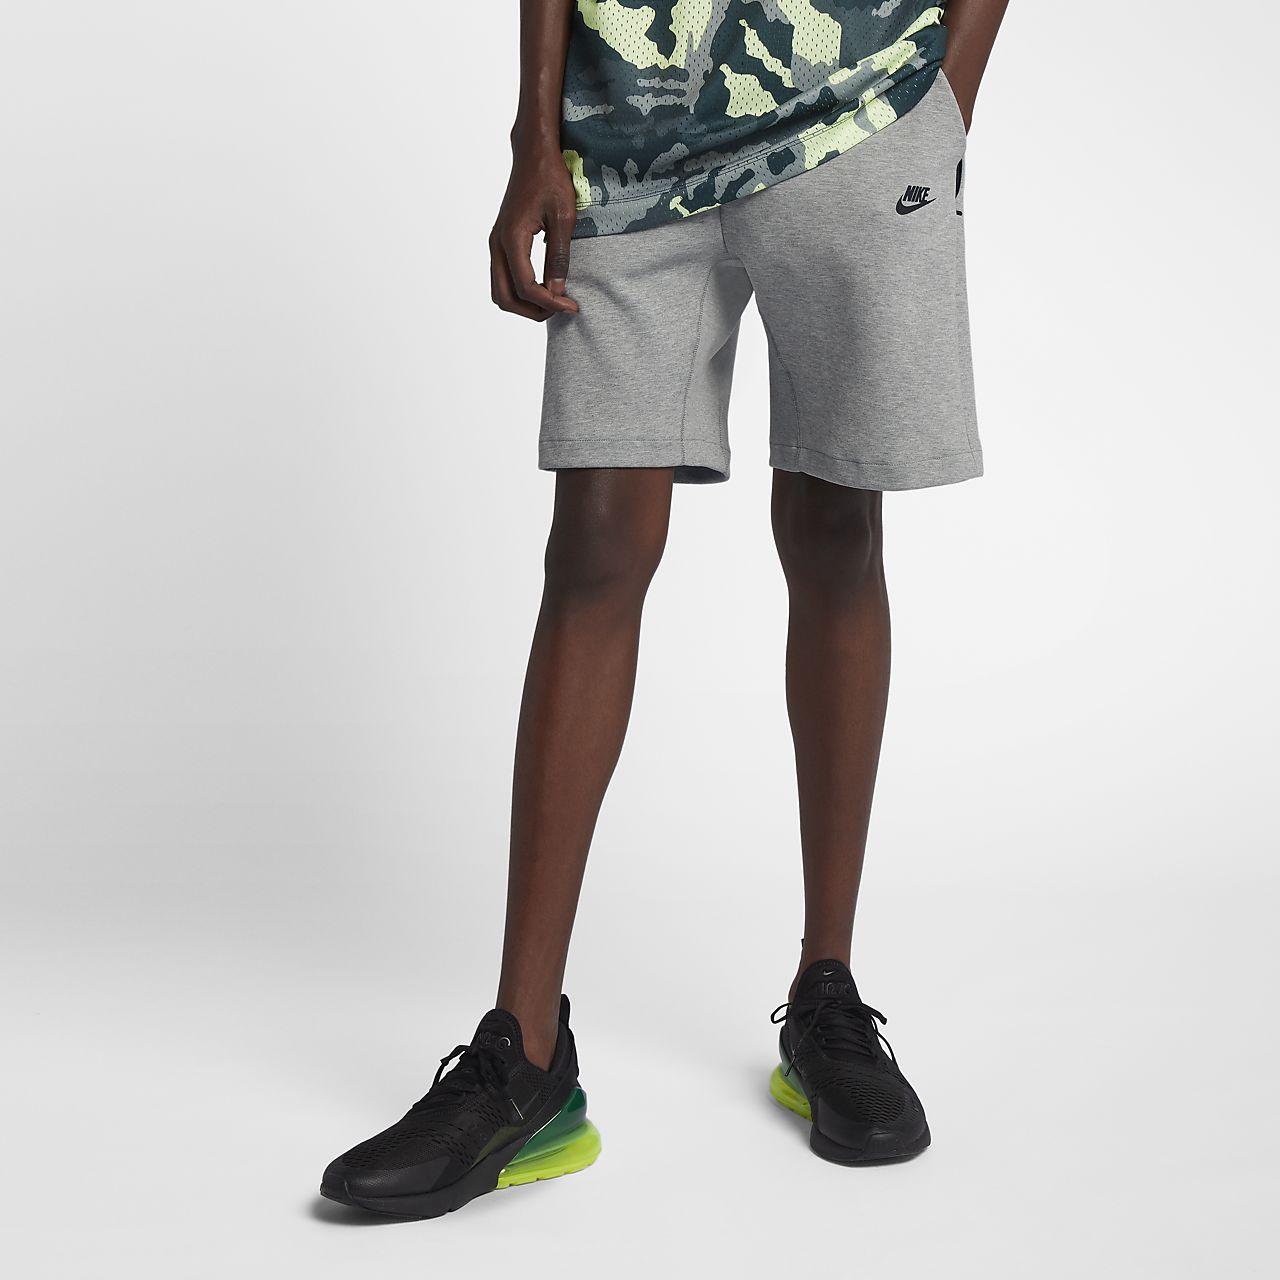 4a7931ab9d8b Nike Sportswear Tech Fleece Men s Shorts. Nike.com GB